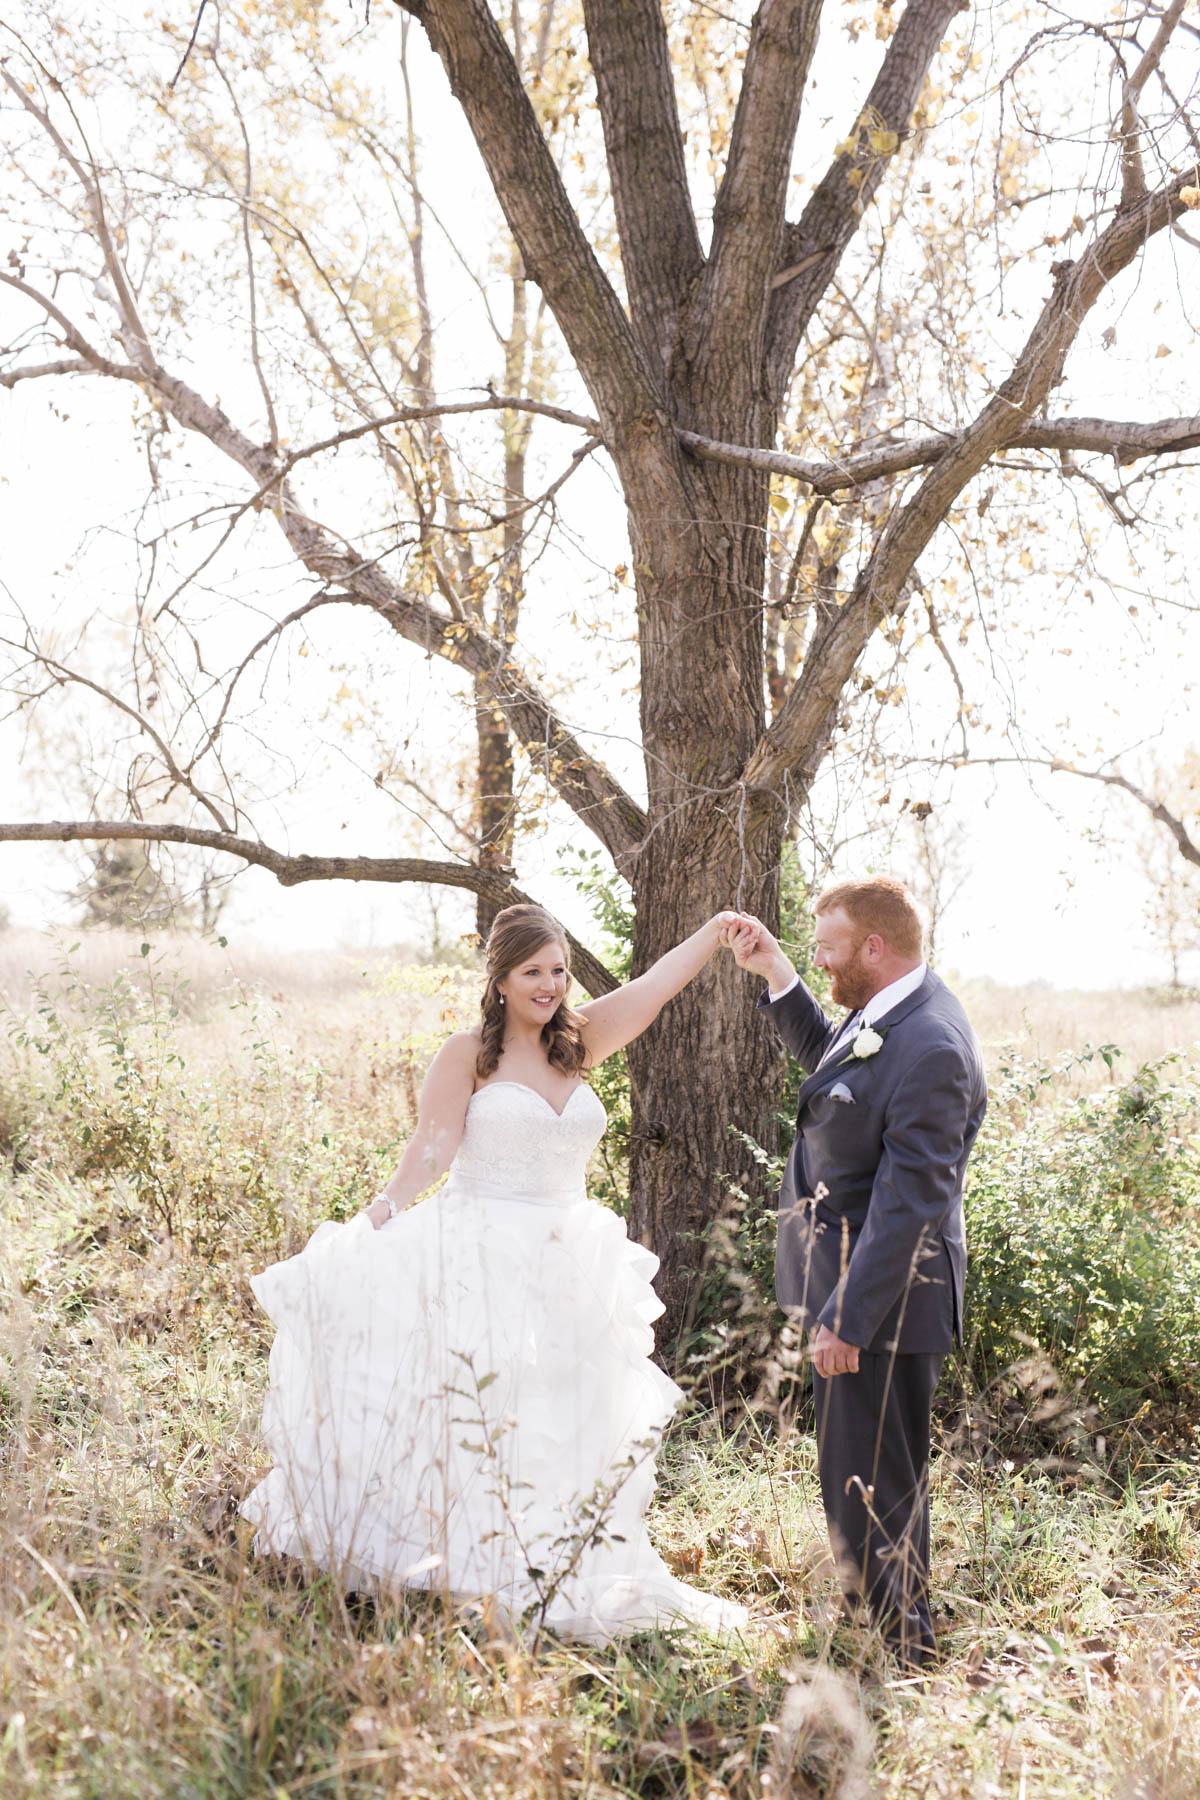 shotbychelsea_blog_wedding-20.jpg